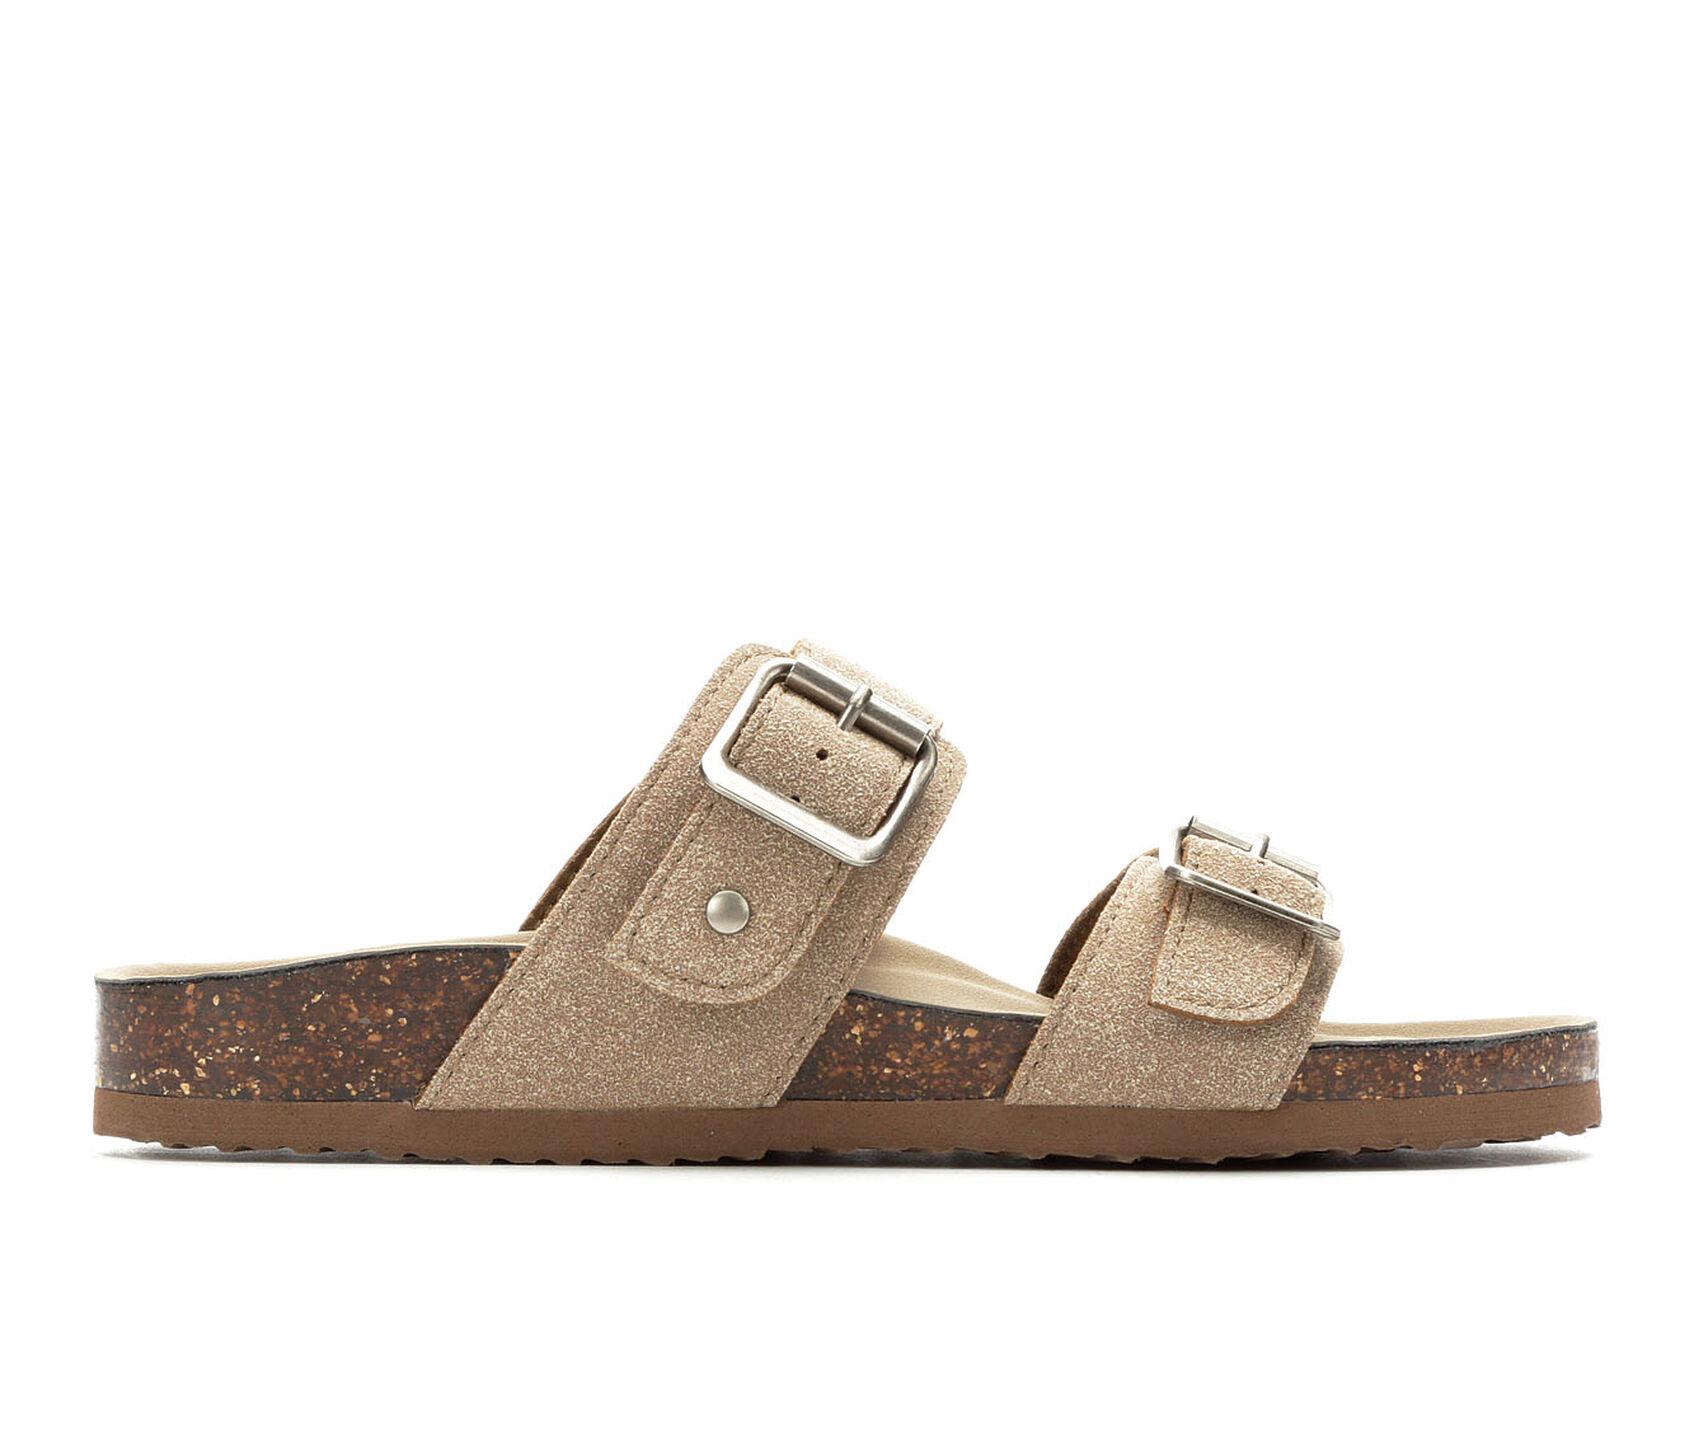 79f5232d3 Women's Madden Girl Brando Footbed Sandals | Shoe Carnival